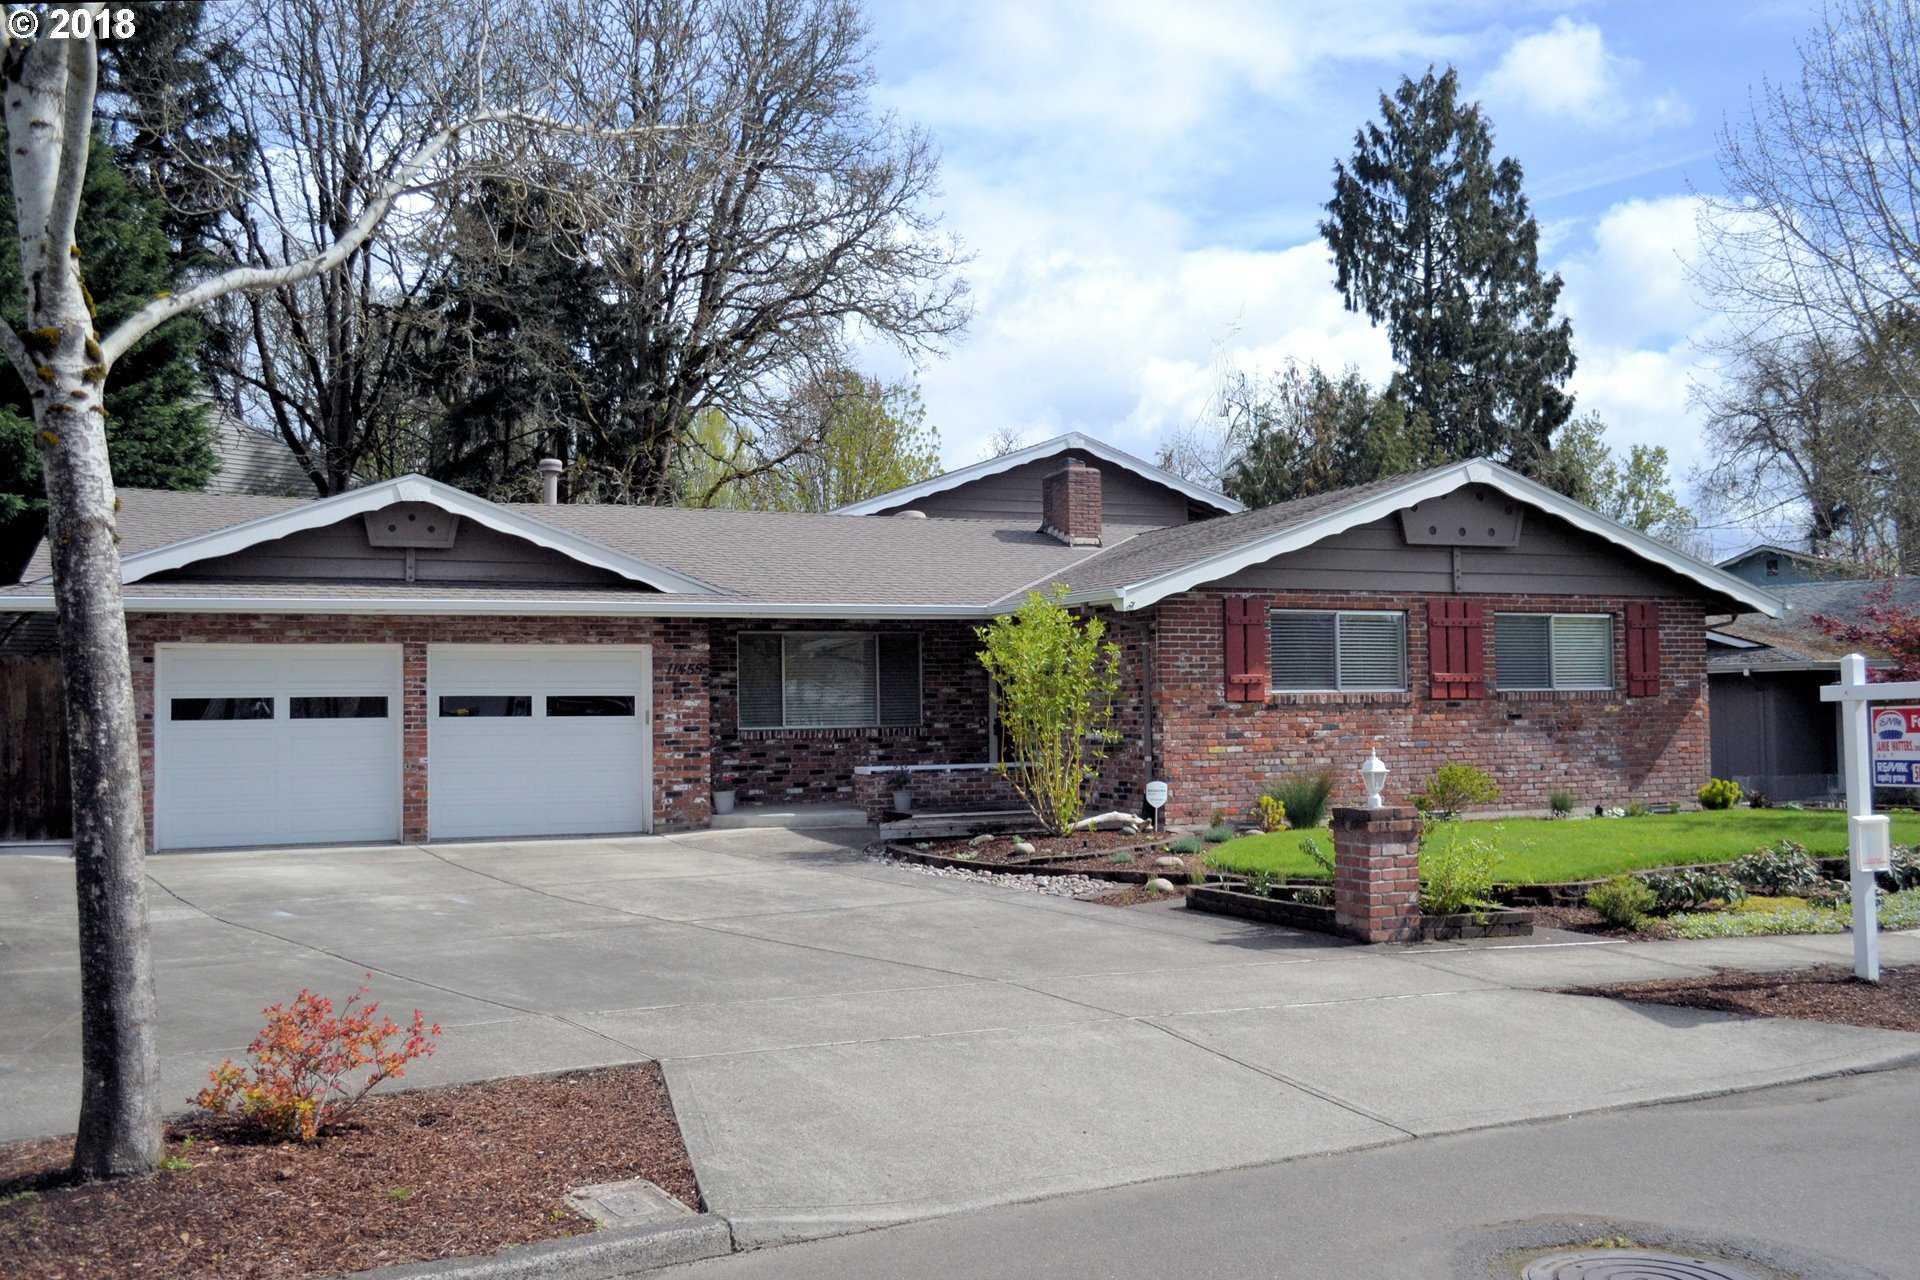 $484,900 - 6Br/5Ba -  for Sale in Vose, Beaverton